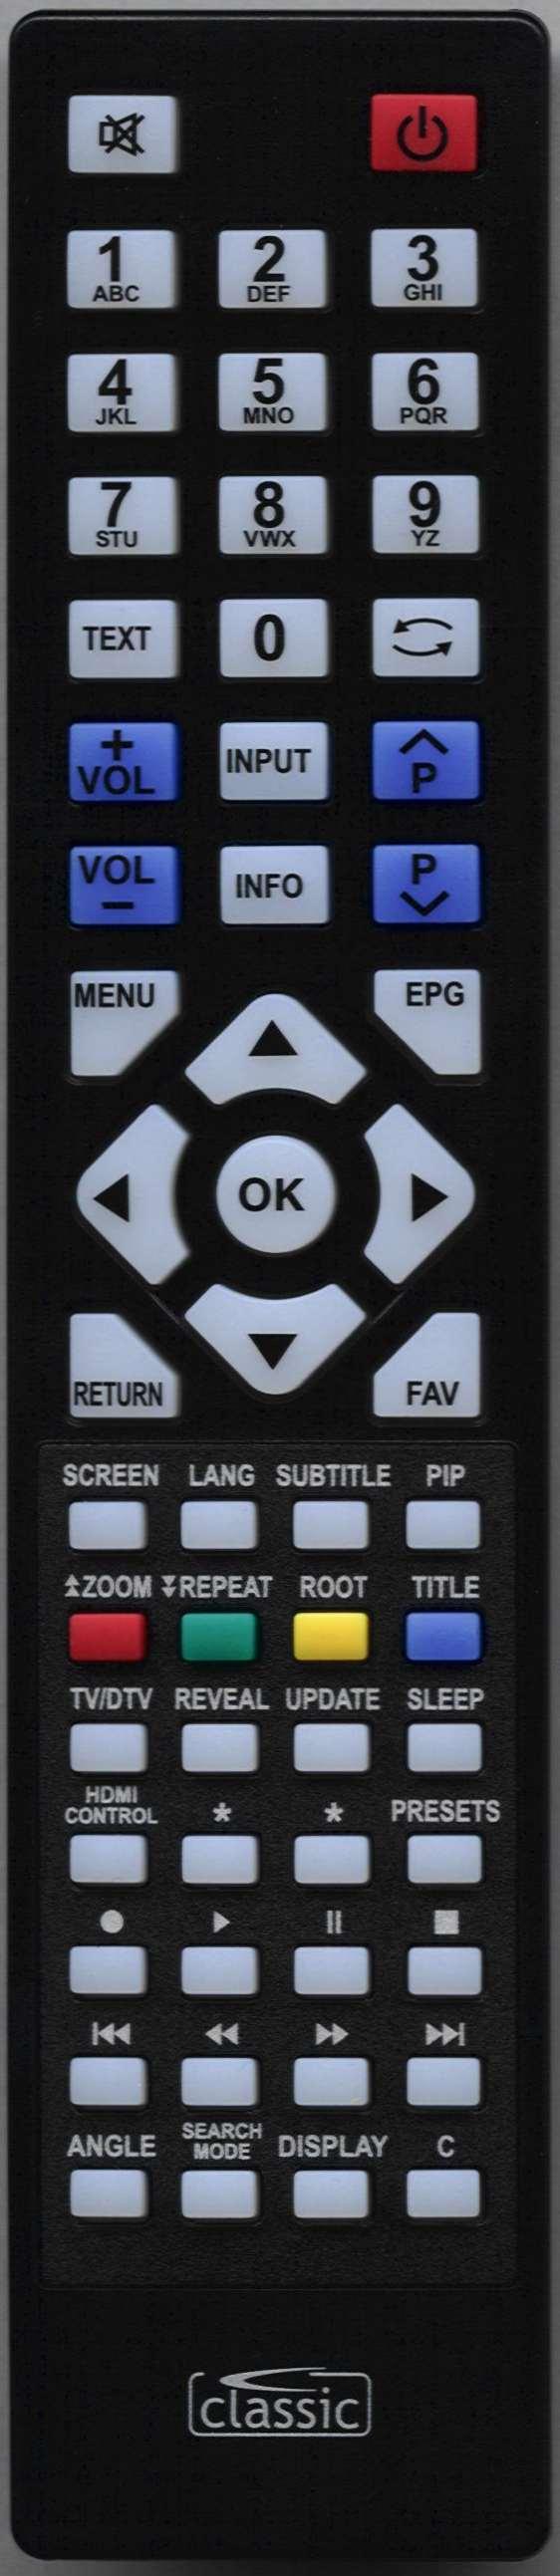 POLAROID PB32DLED13 Remote Control Alternative